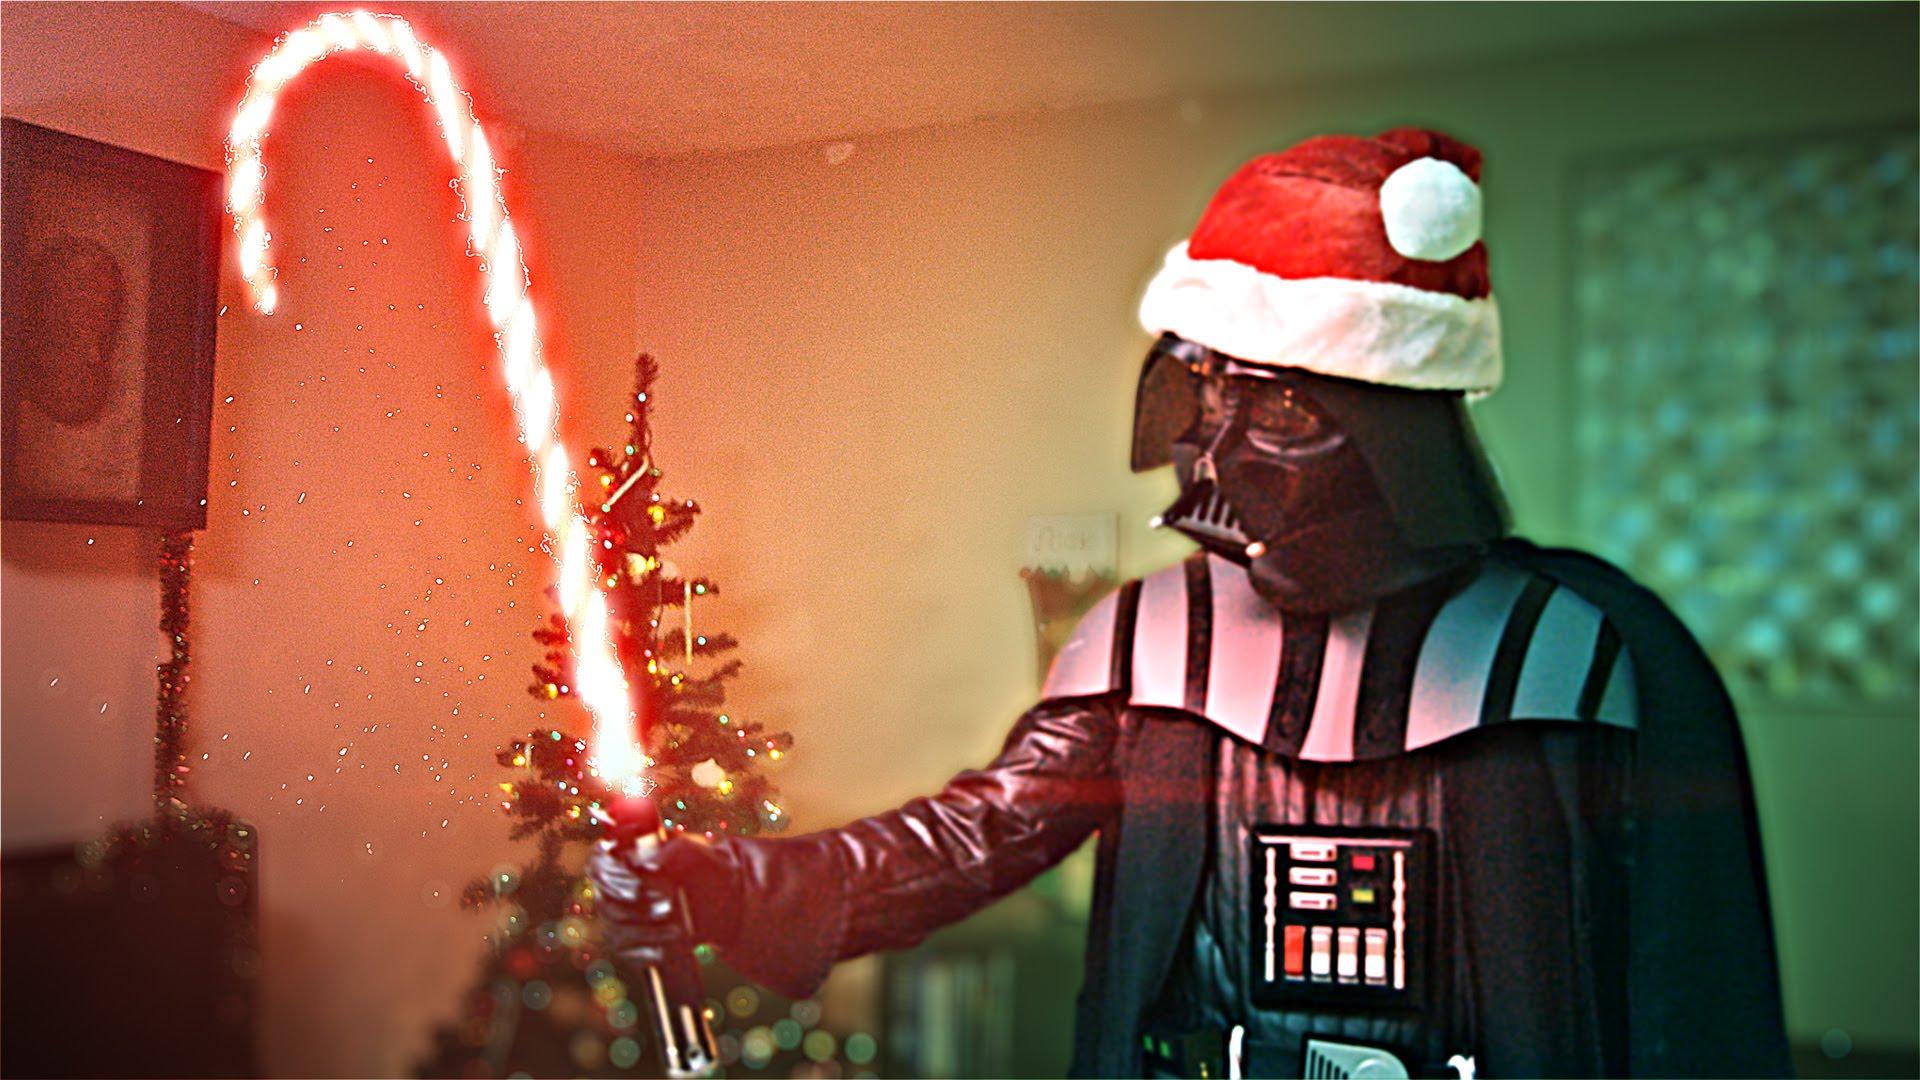 Darth Santa Amuses Himself By Destroying Christmas